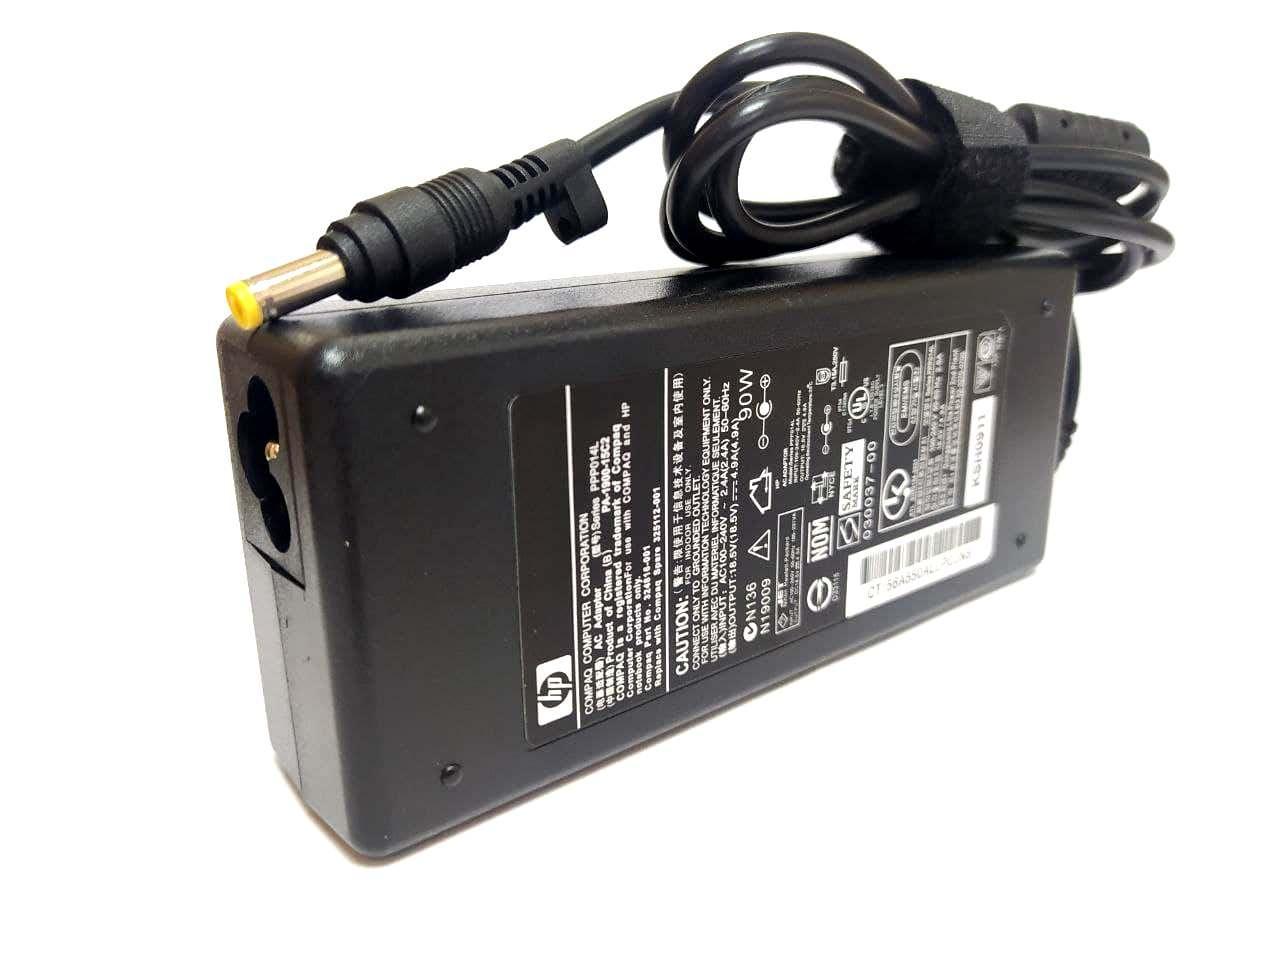 Блок питания для ноутбука HP Pavilion dv6650er 18.5V 4.9A 4.8*1.7mm 90W